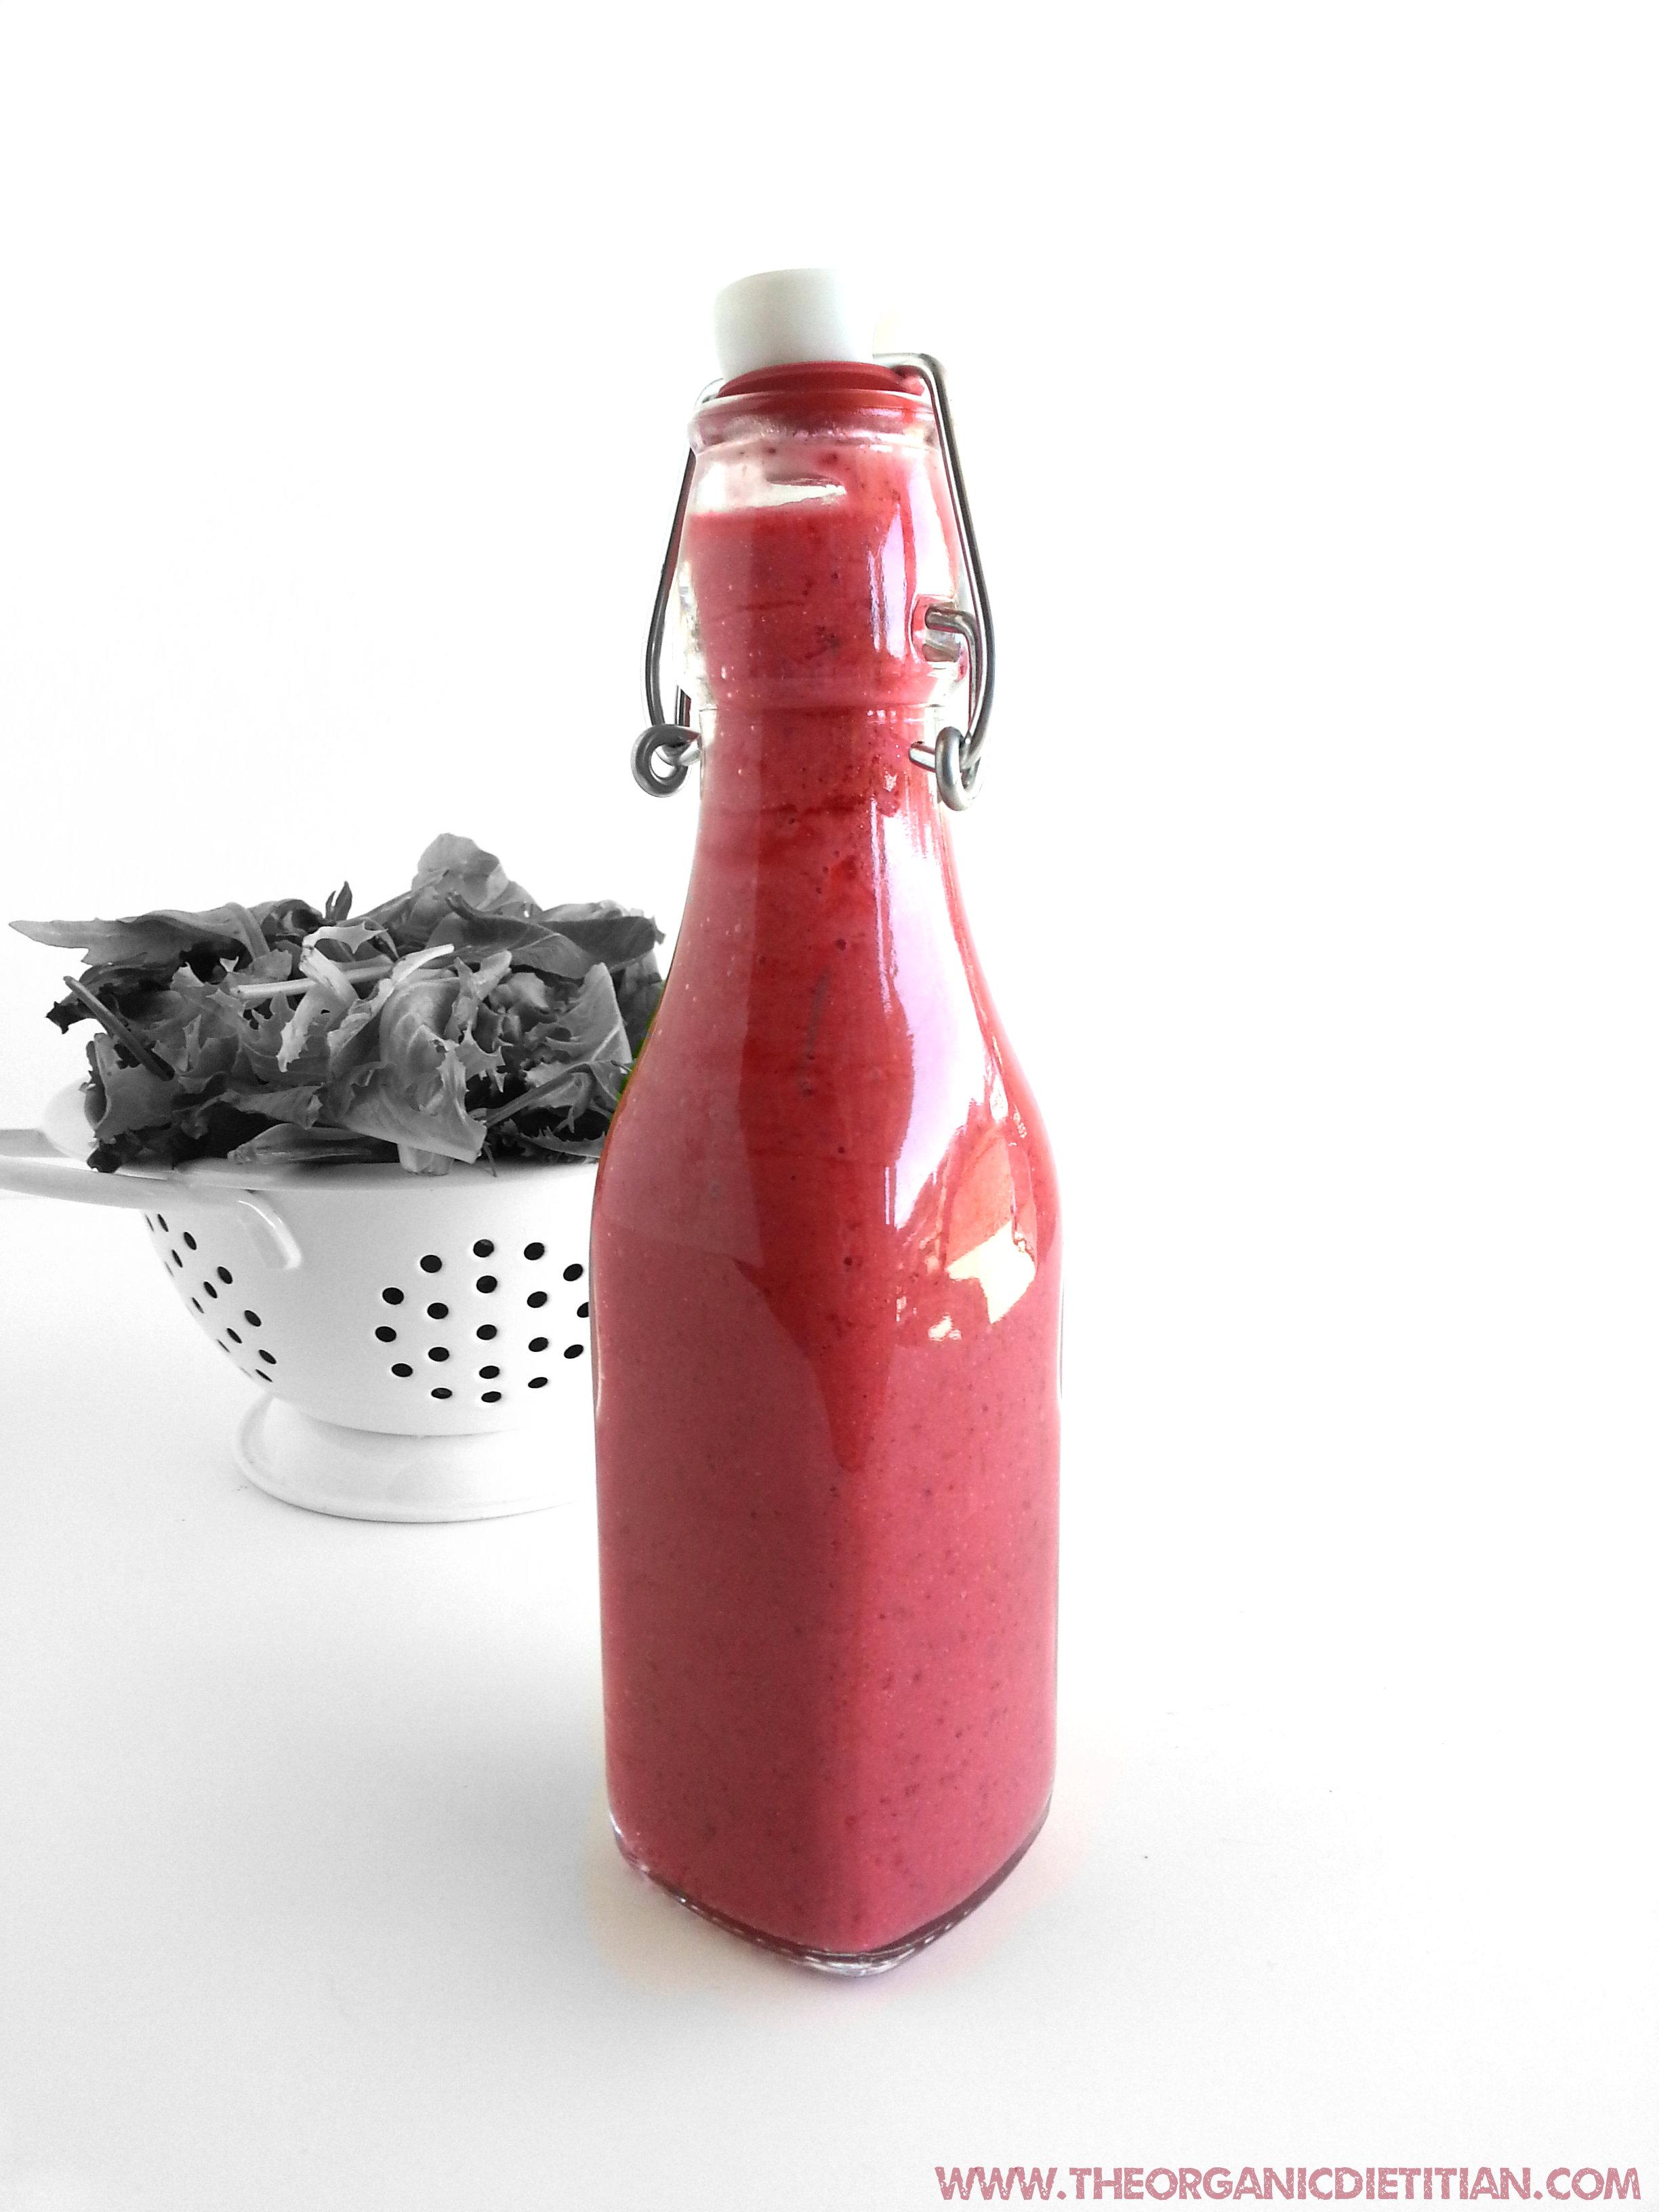 Raspberry vinaigrette A